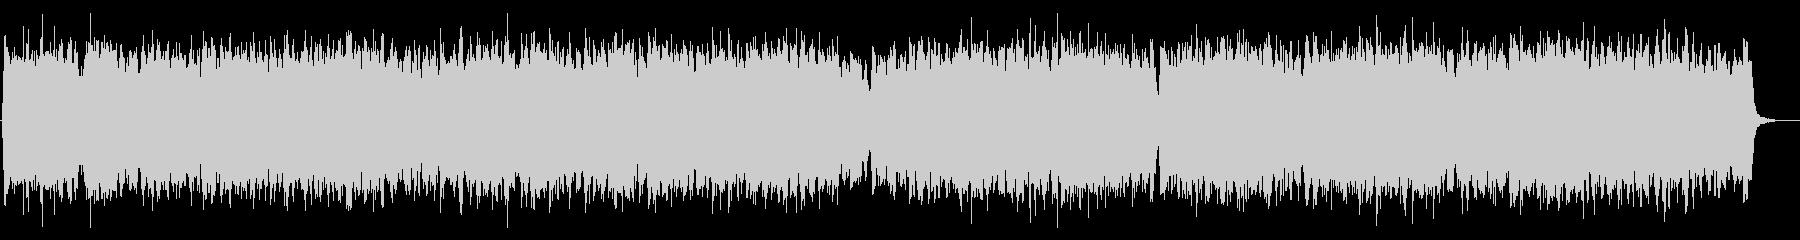 「G線上のアリア」をシンセベル音で。の未再生の波形